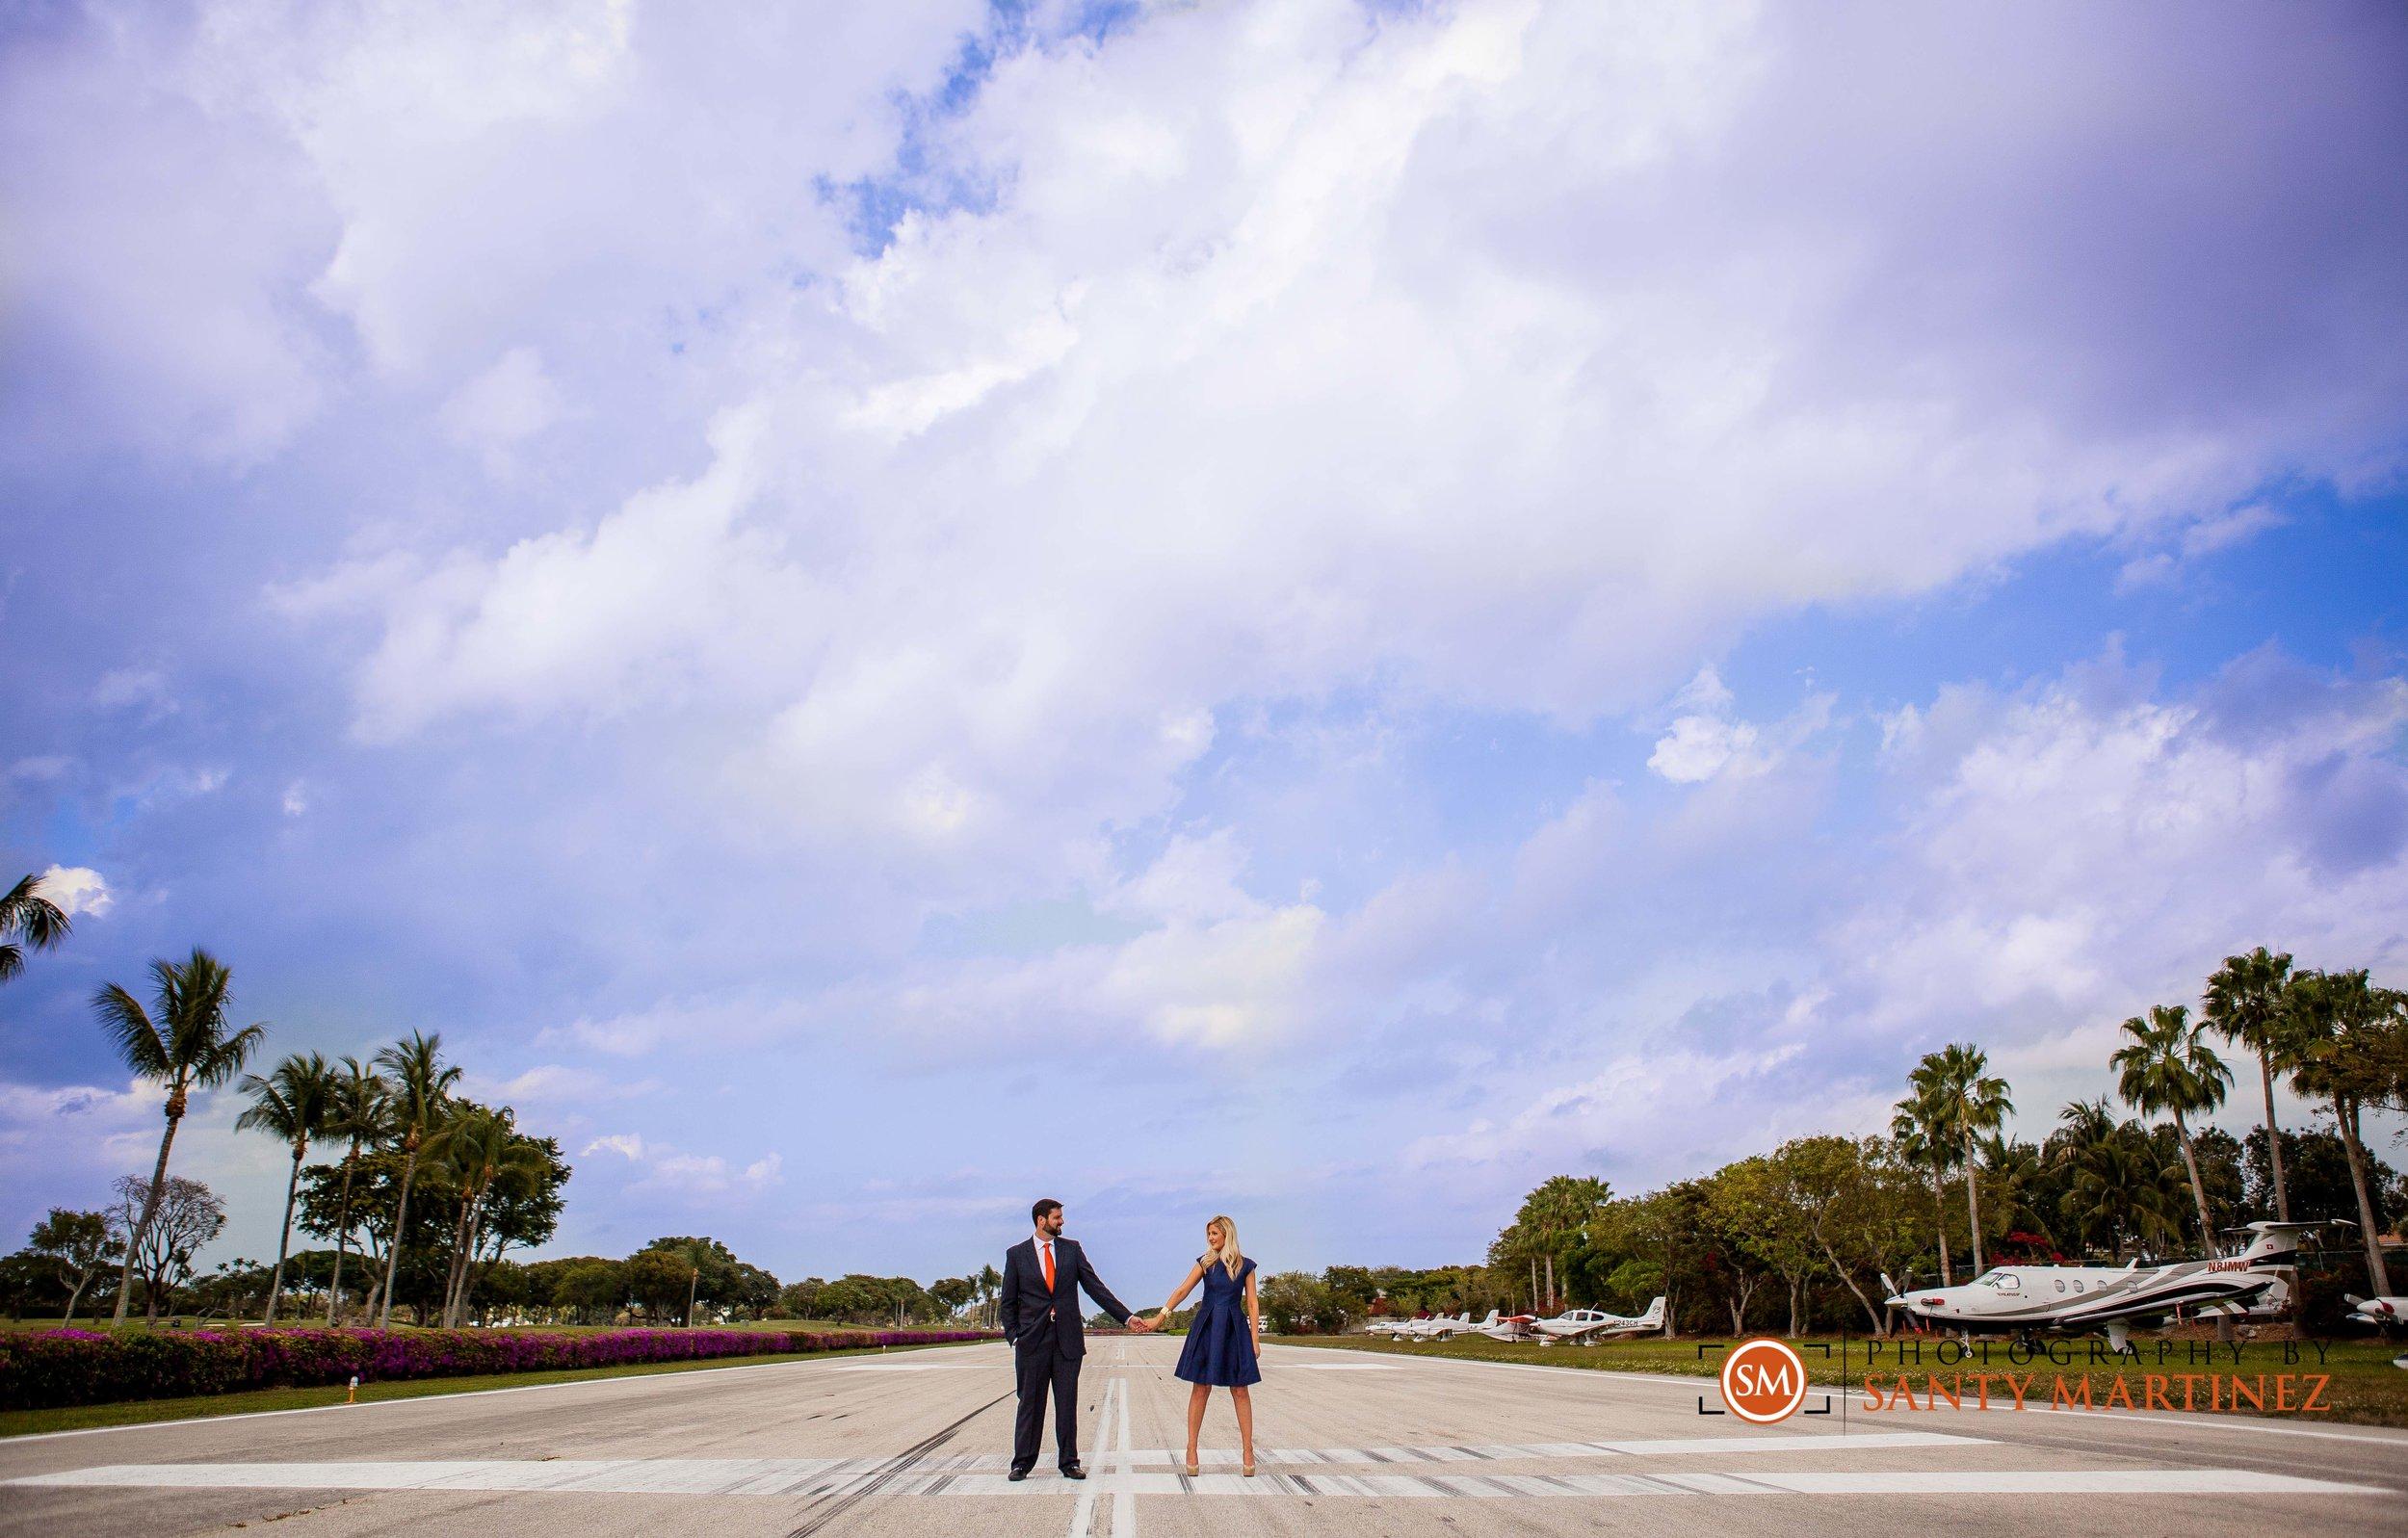 Photography by Santy Martinez - Miami Wedding Photographer-1.jpg